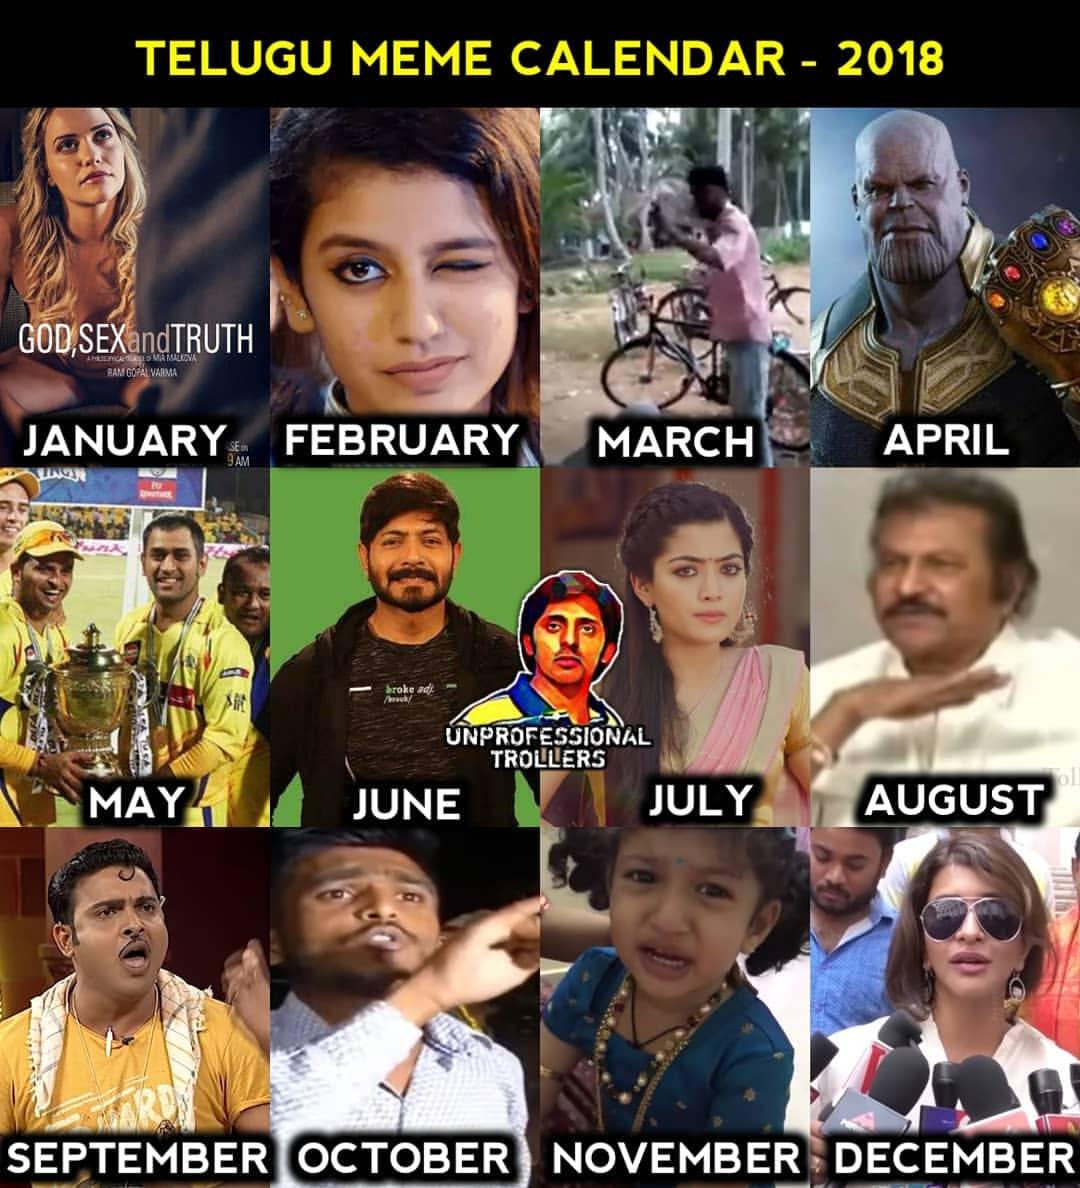 Telugu meme calendar 2018 telugu memes